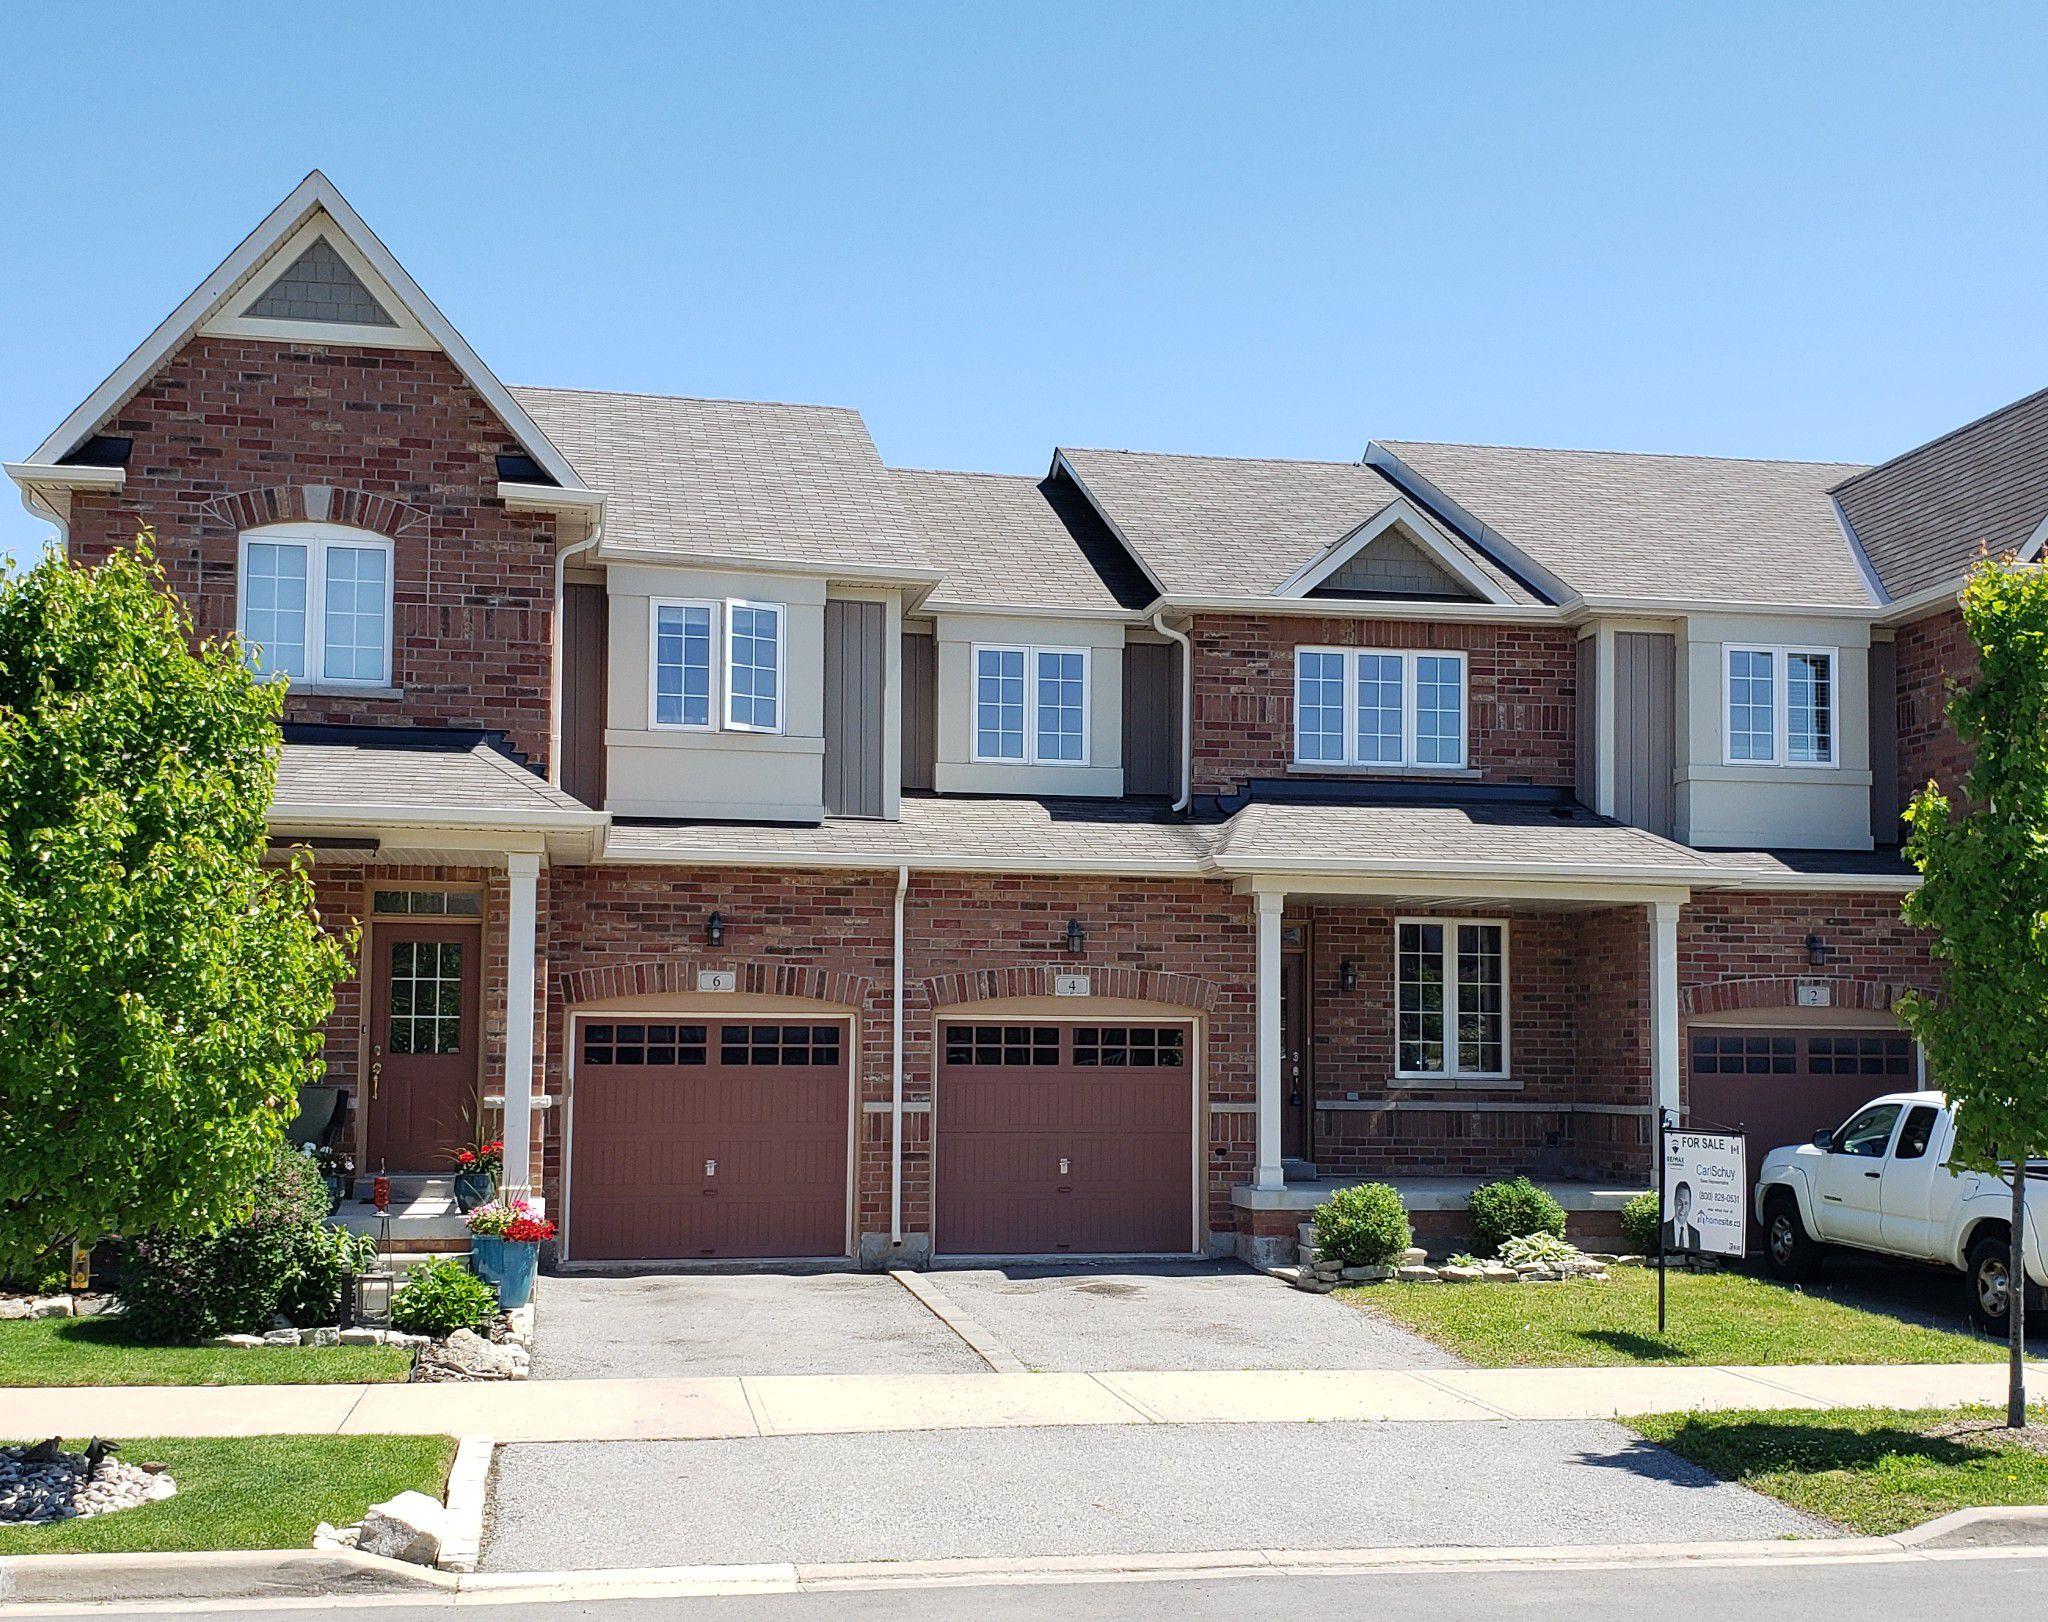 Main Photo: 4 Gunby Blvd: Waterdown Freehold for sale (Hamilton)  : MLS®# X4489120